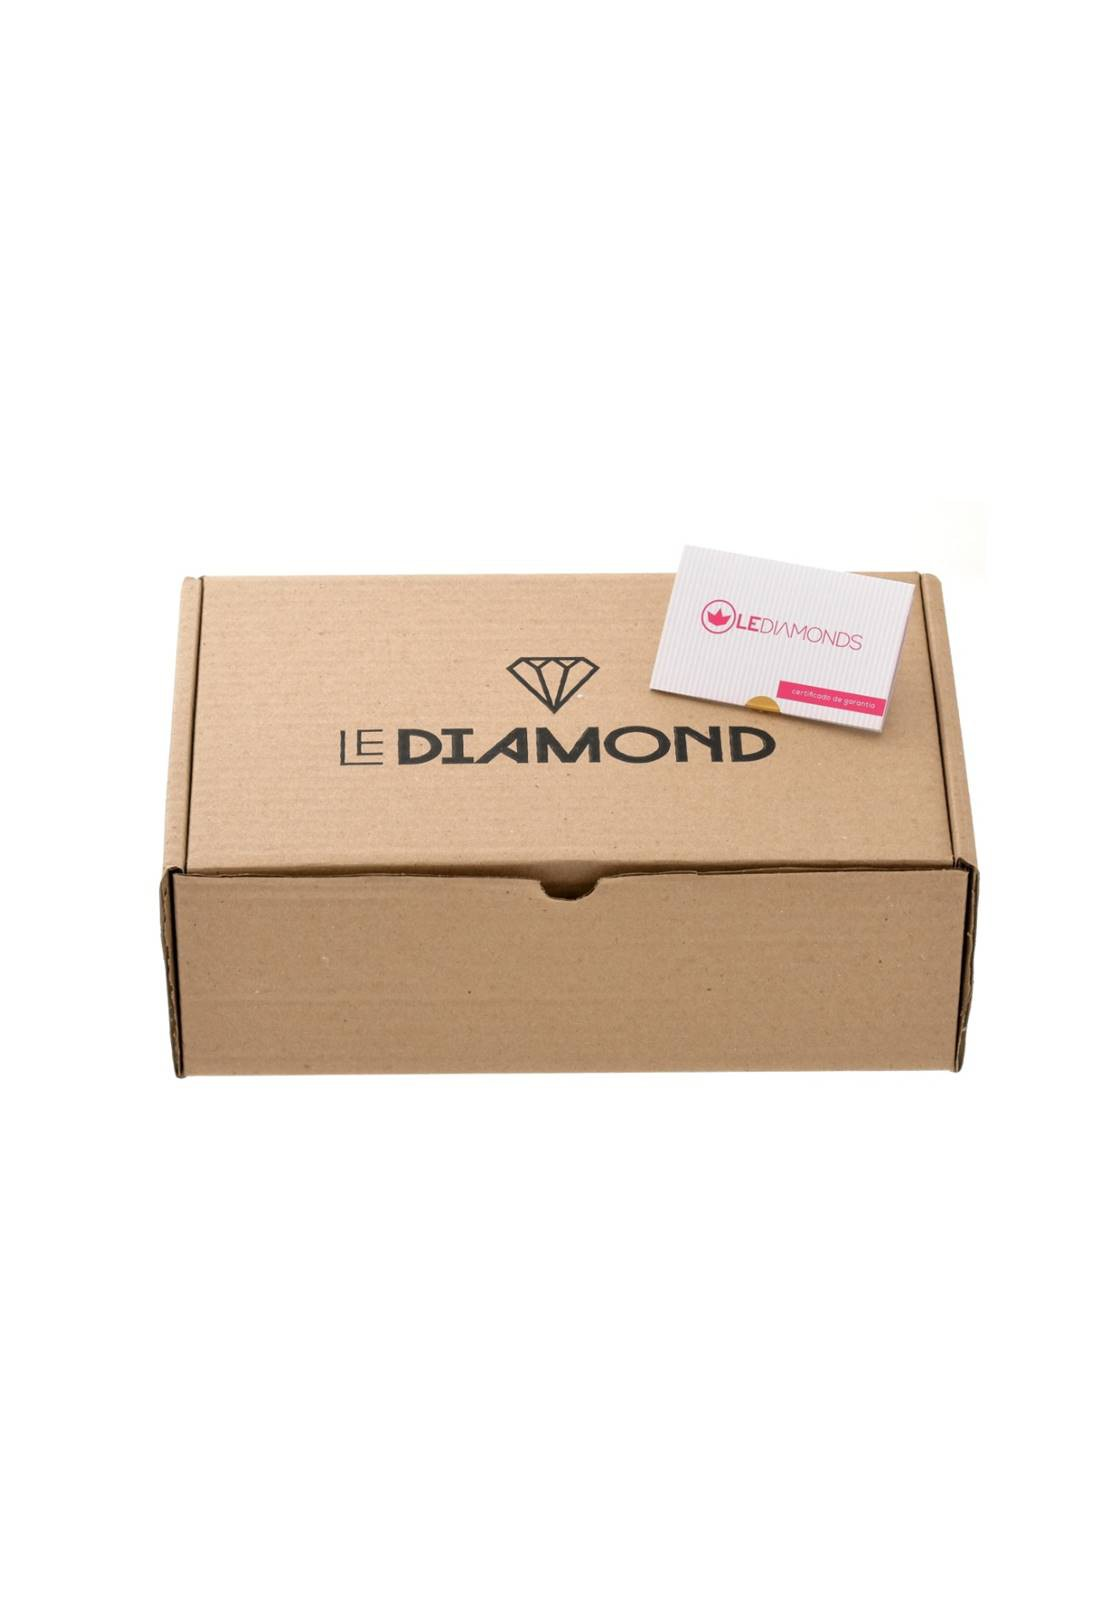 Brinco Le Diamond Ear Jacket Navetes com Pingentes Prata